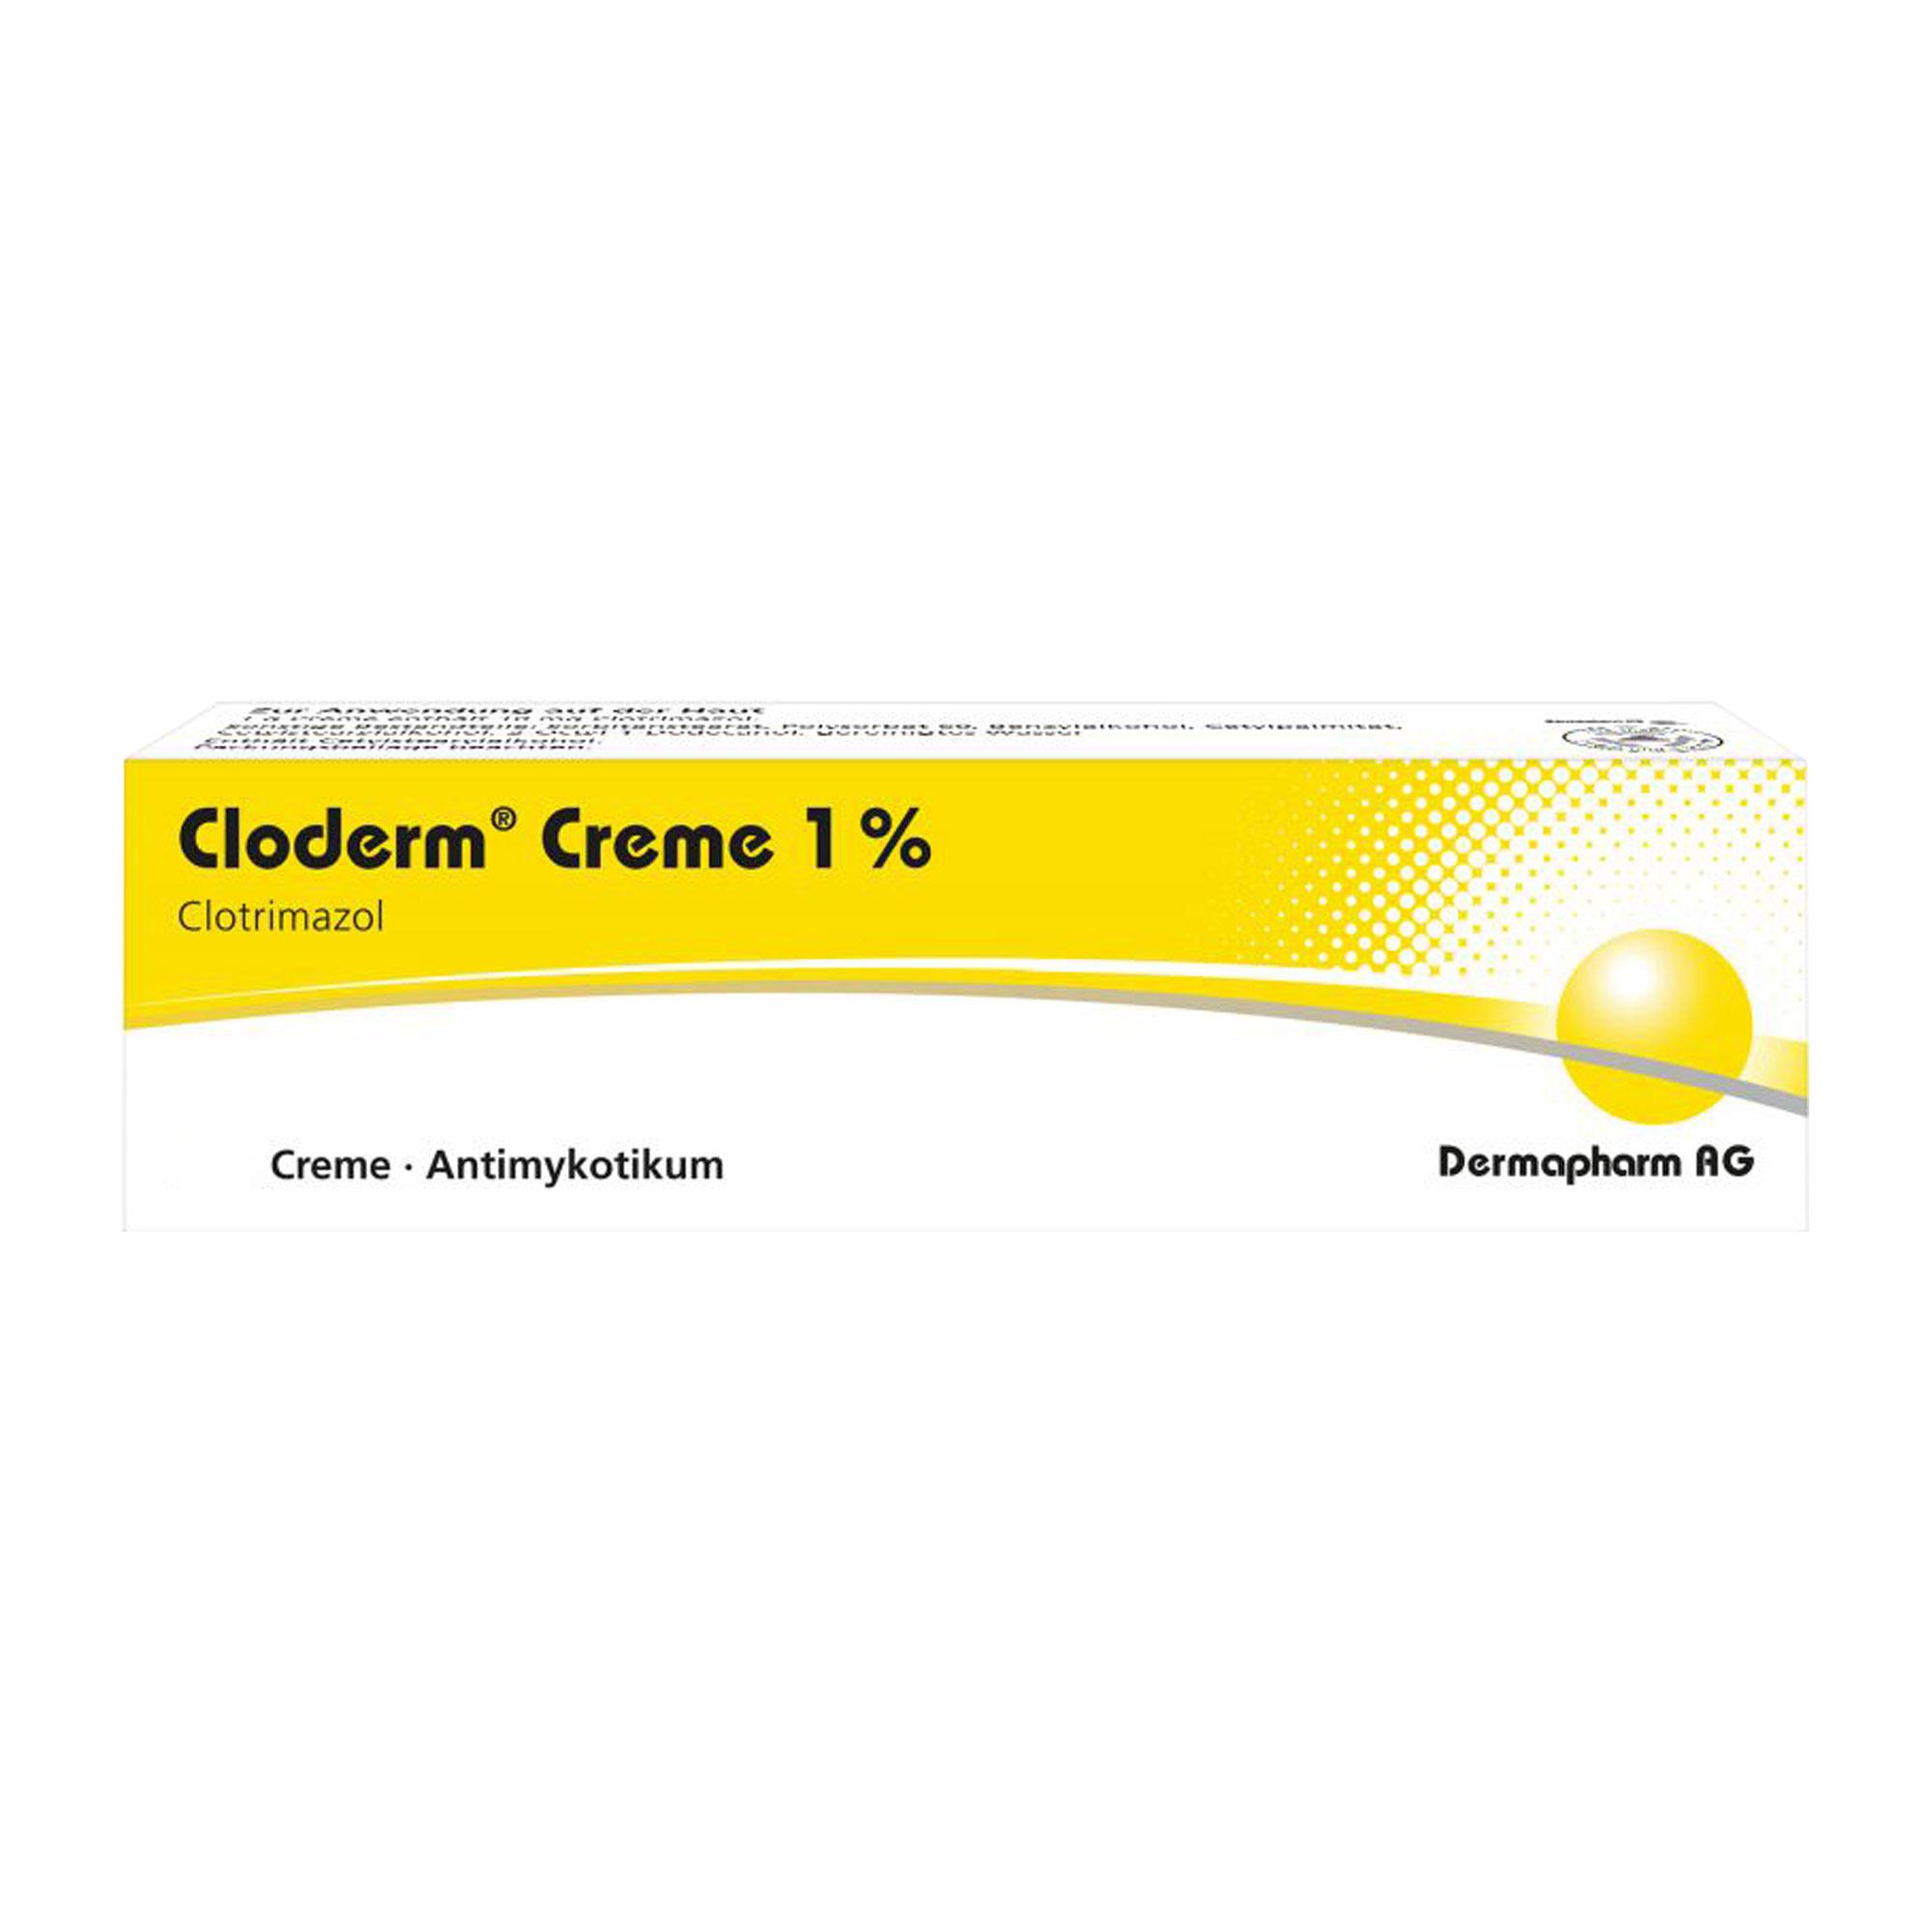 CLODERM CREME 1%